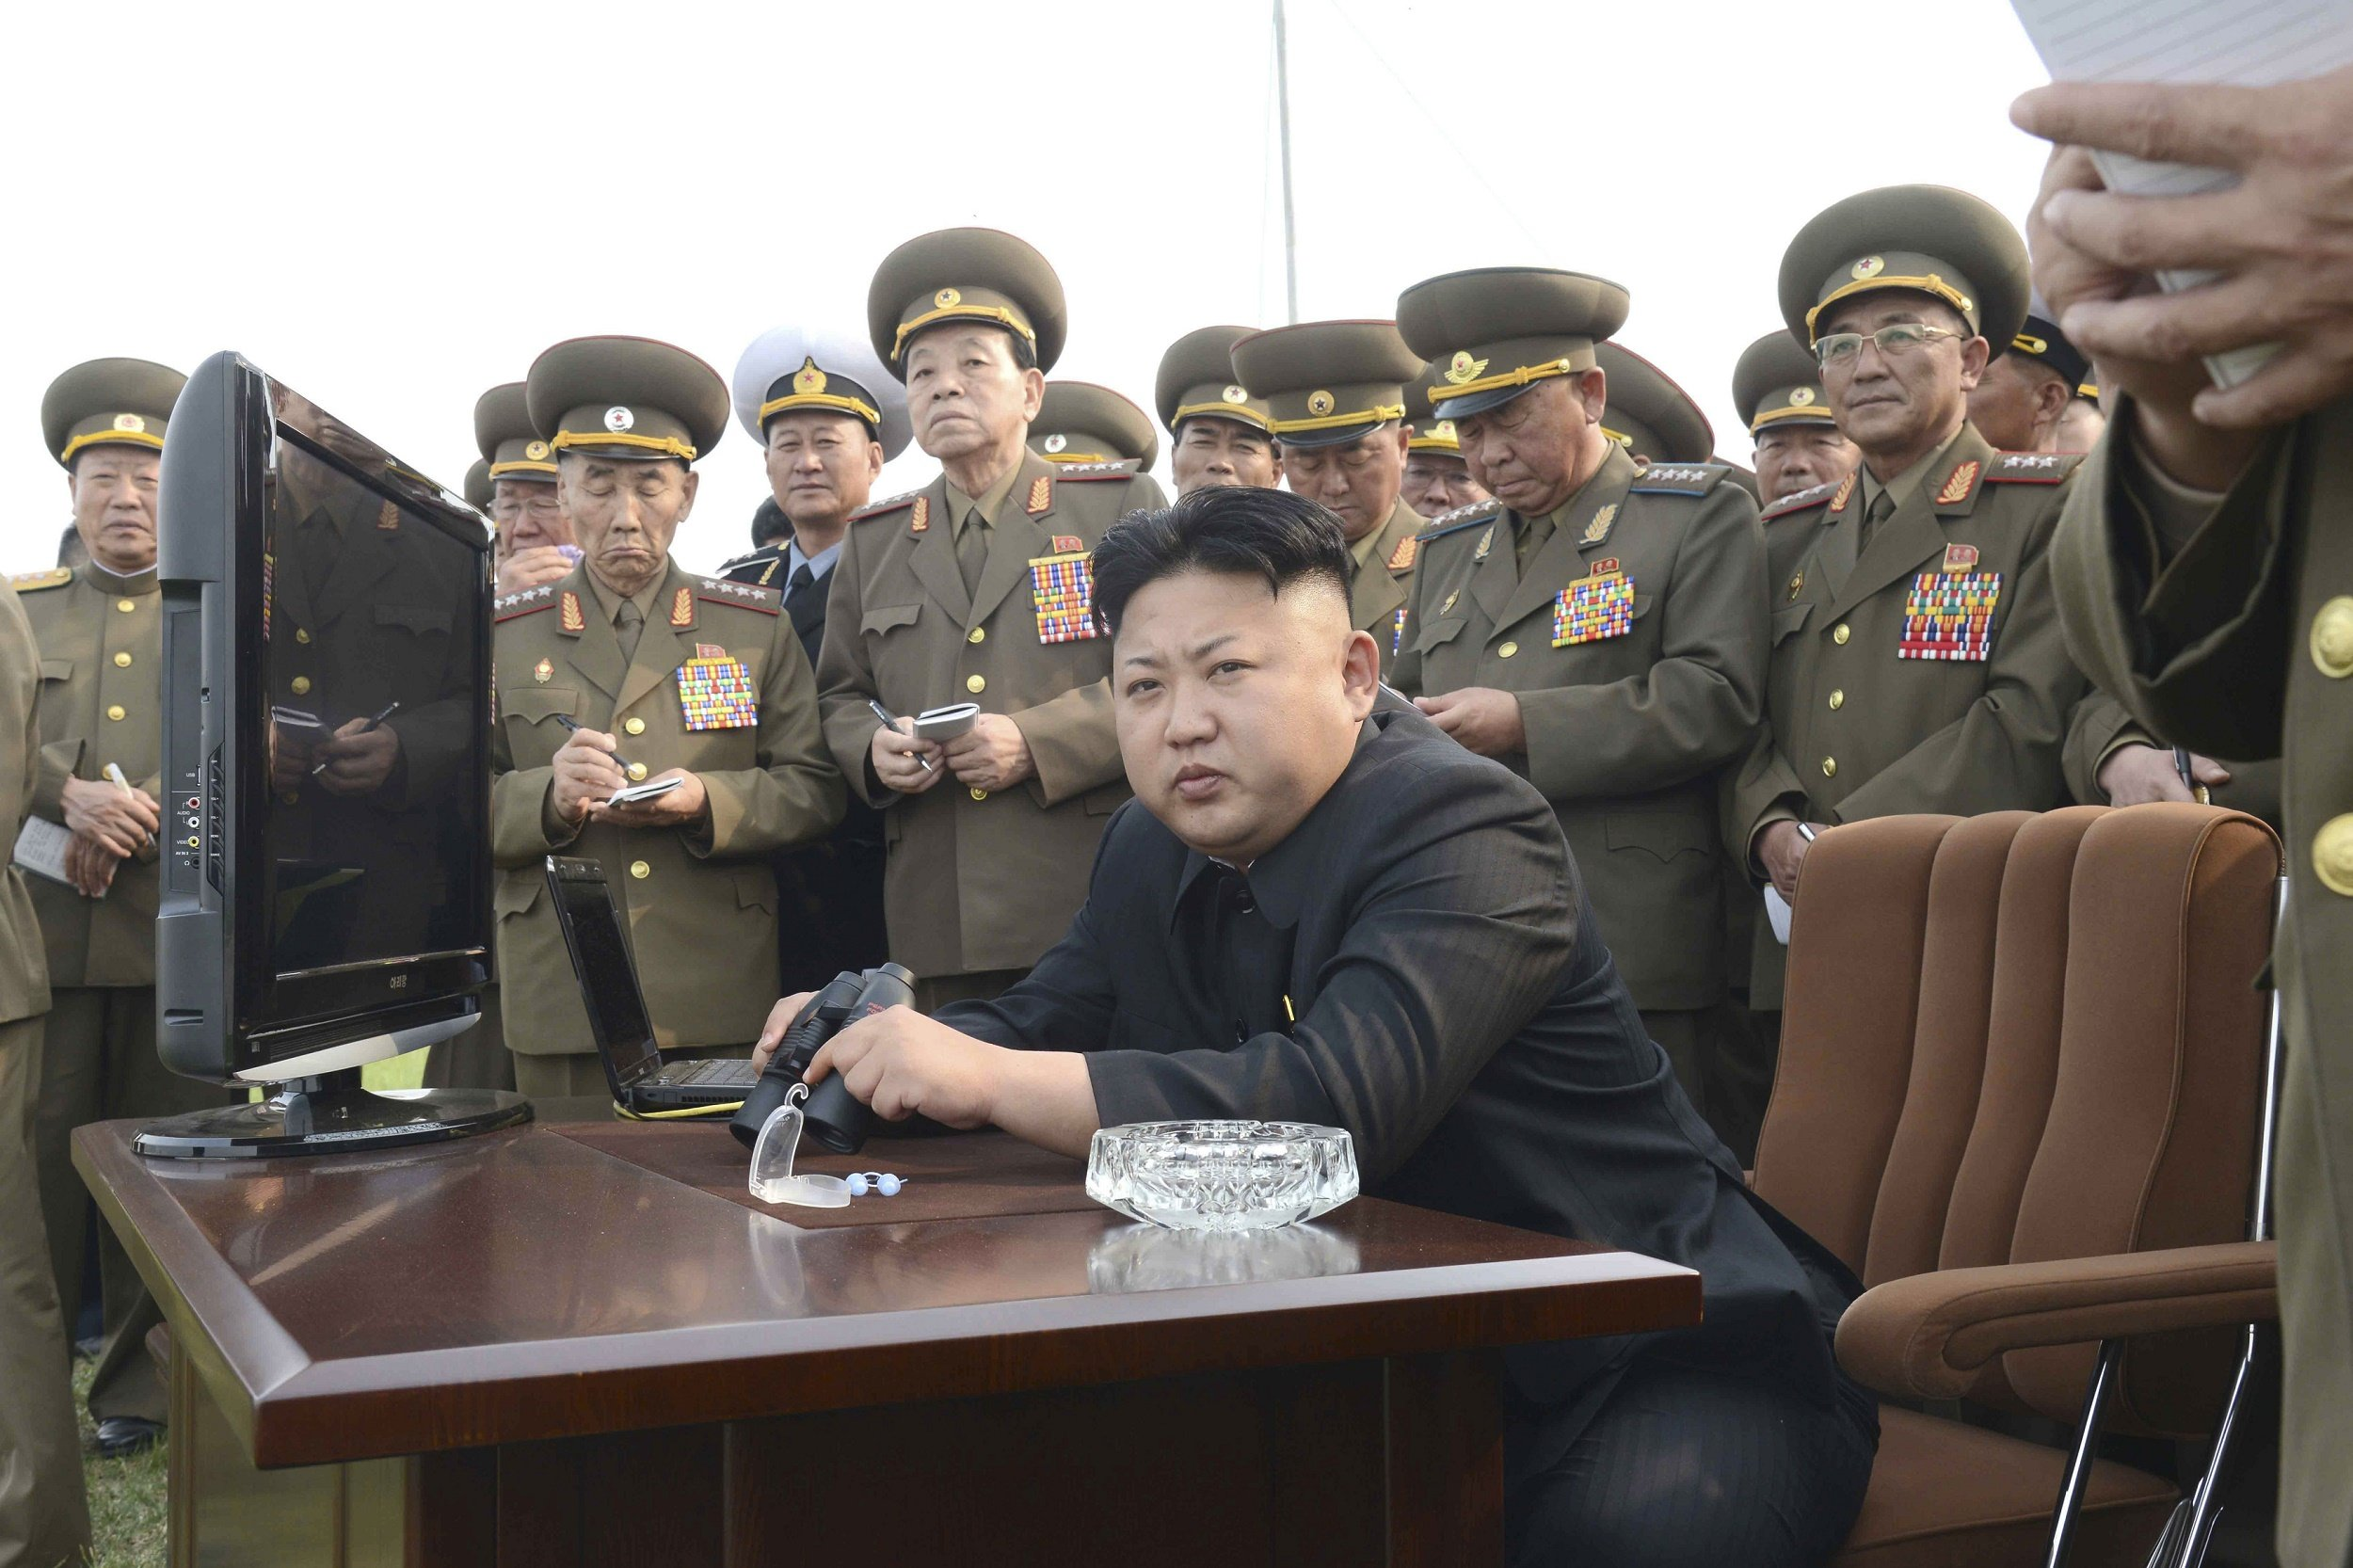 weekly vide north korea - HD2500×1666